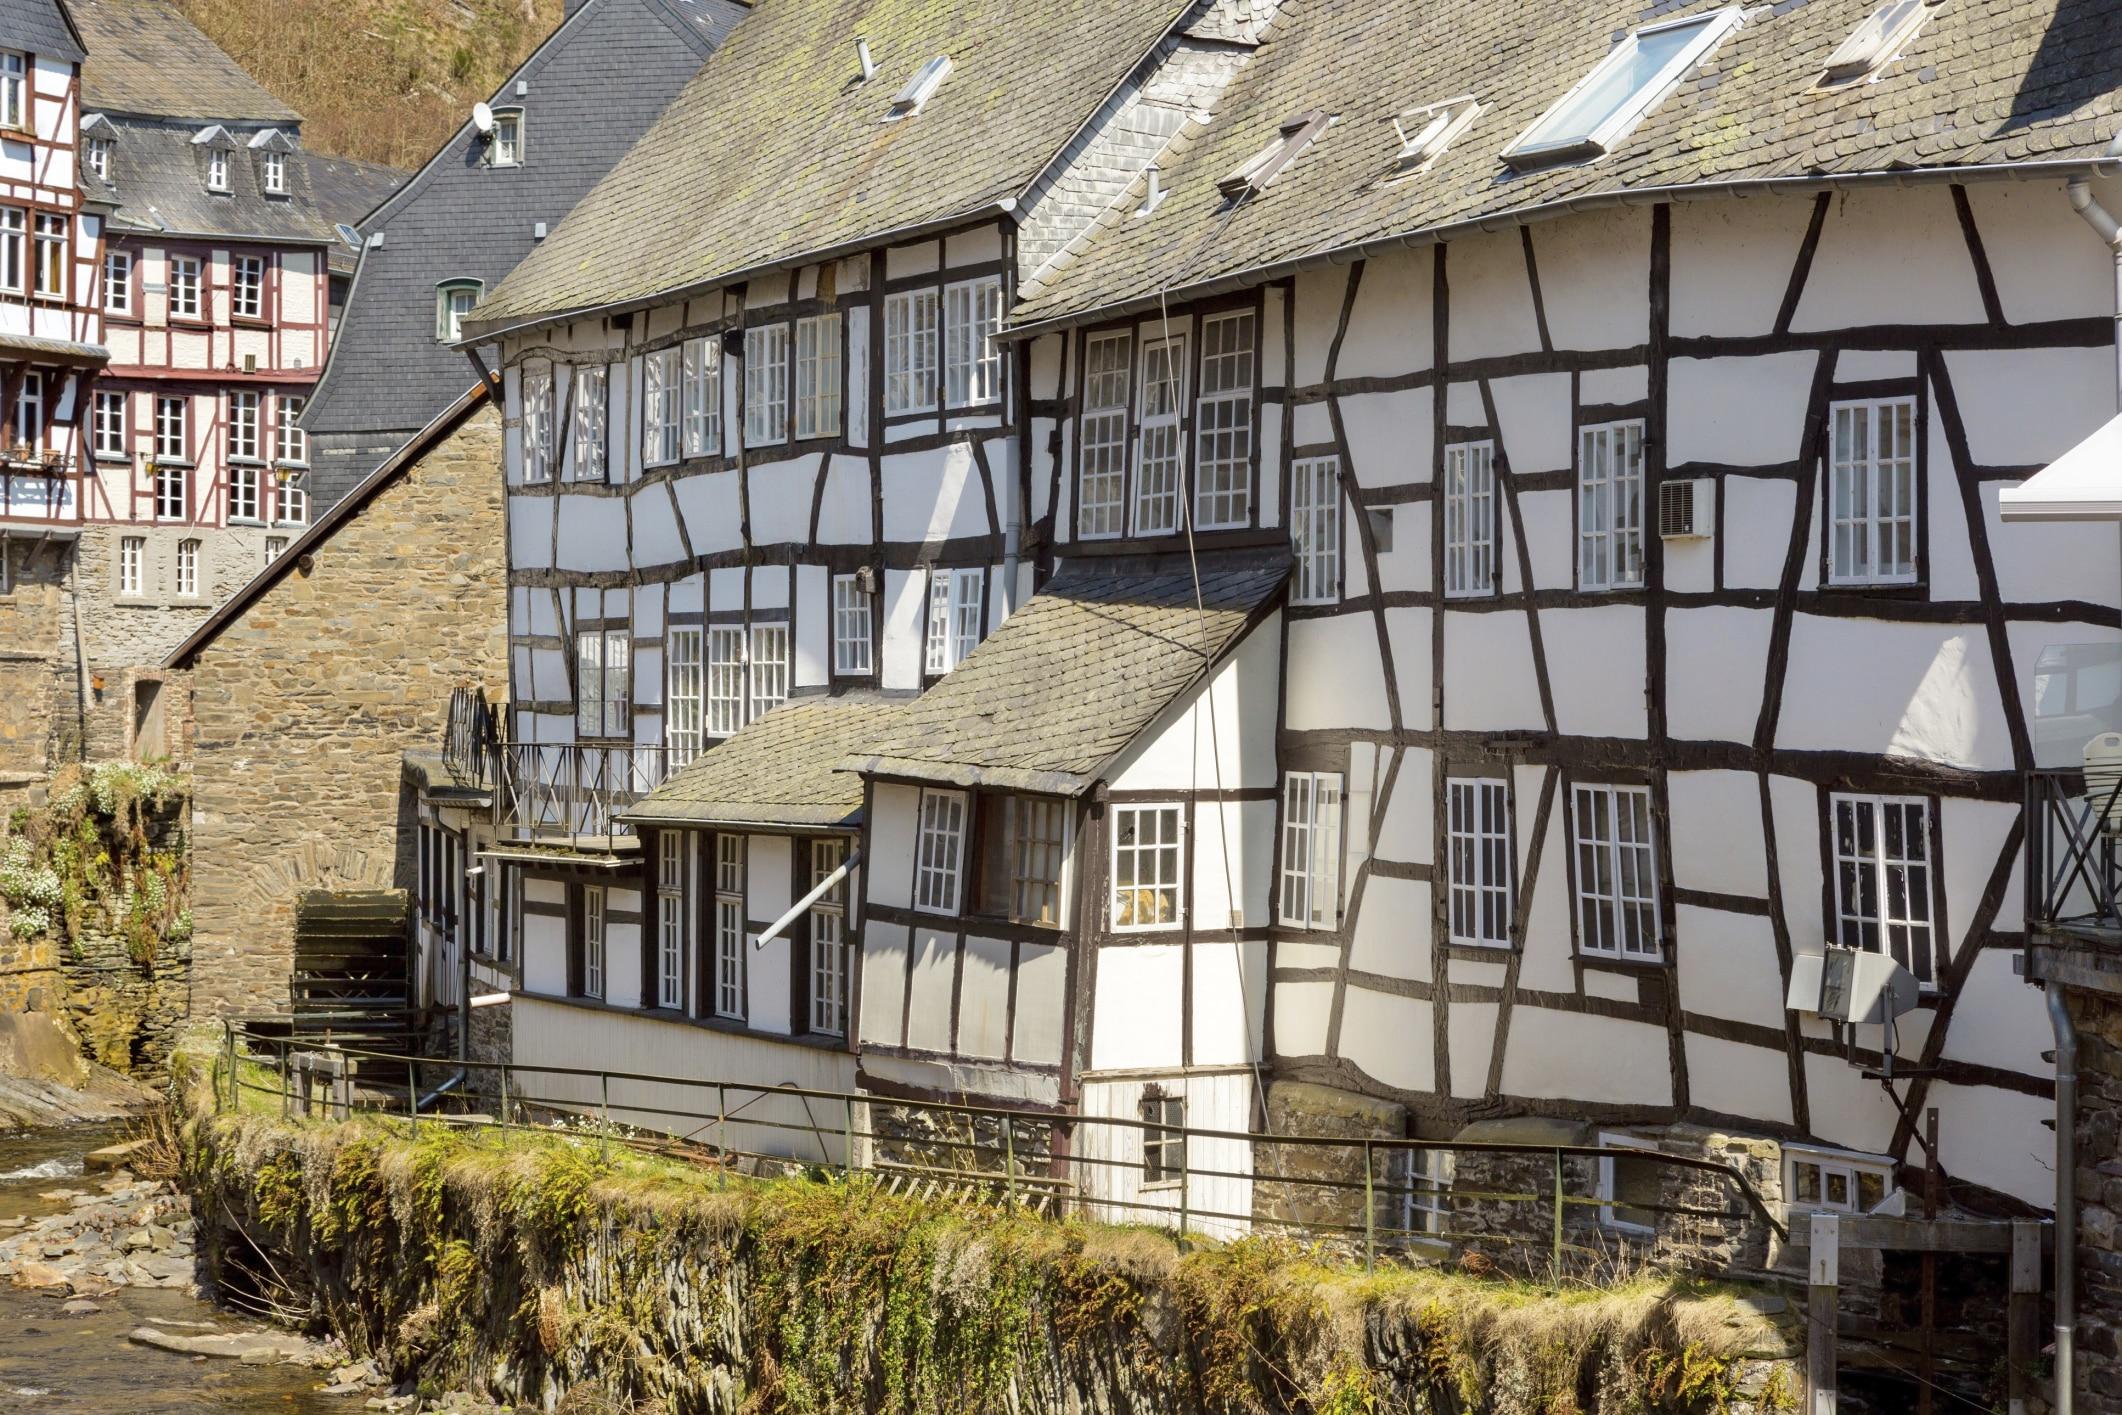 Reisebericht Eifel – Geopark Vulkaneifel - Reise in Deutschland